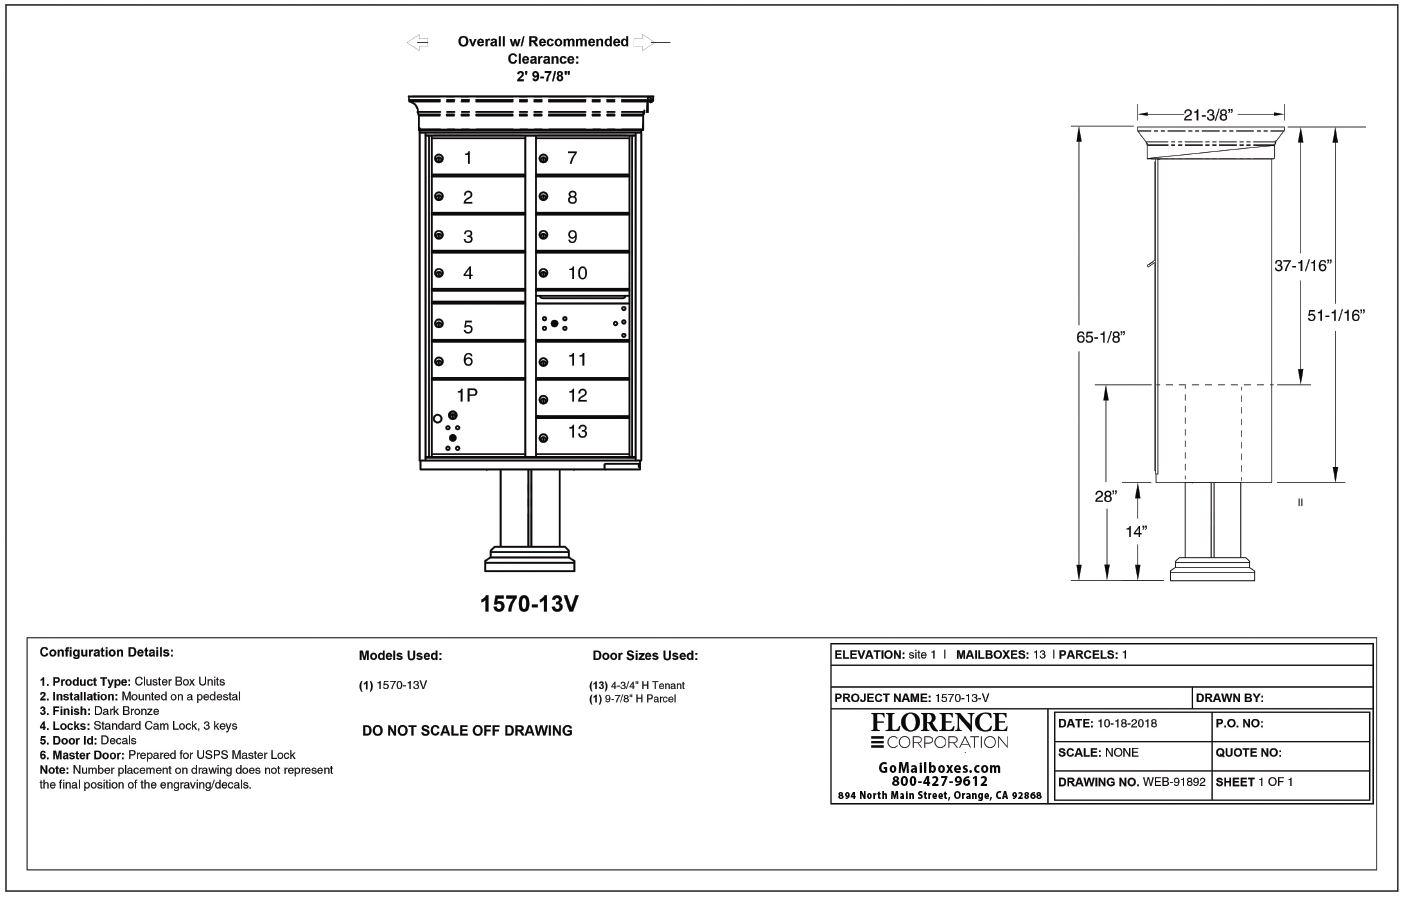 13 Door Classic CBU Diagram